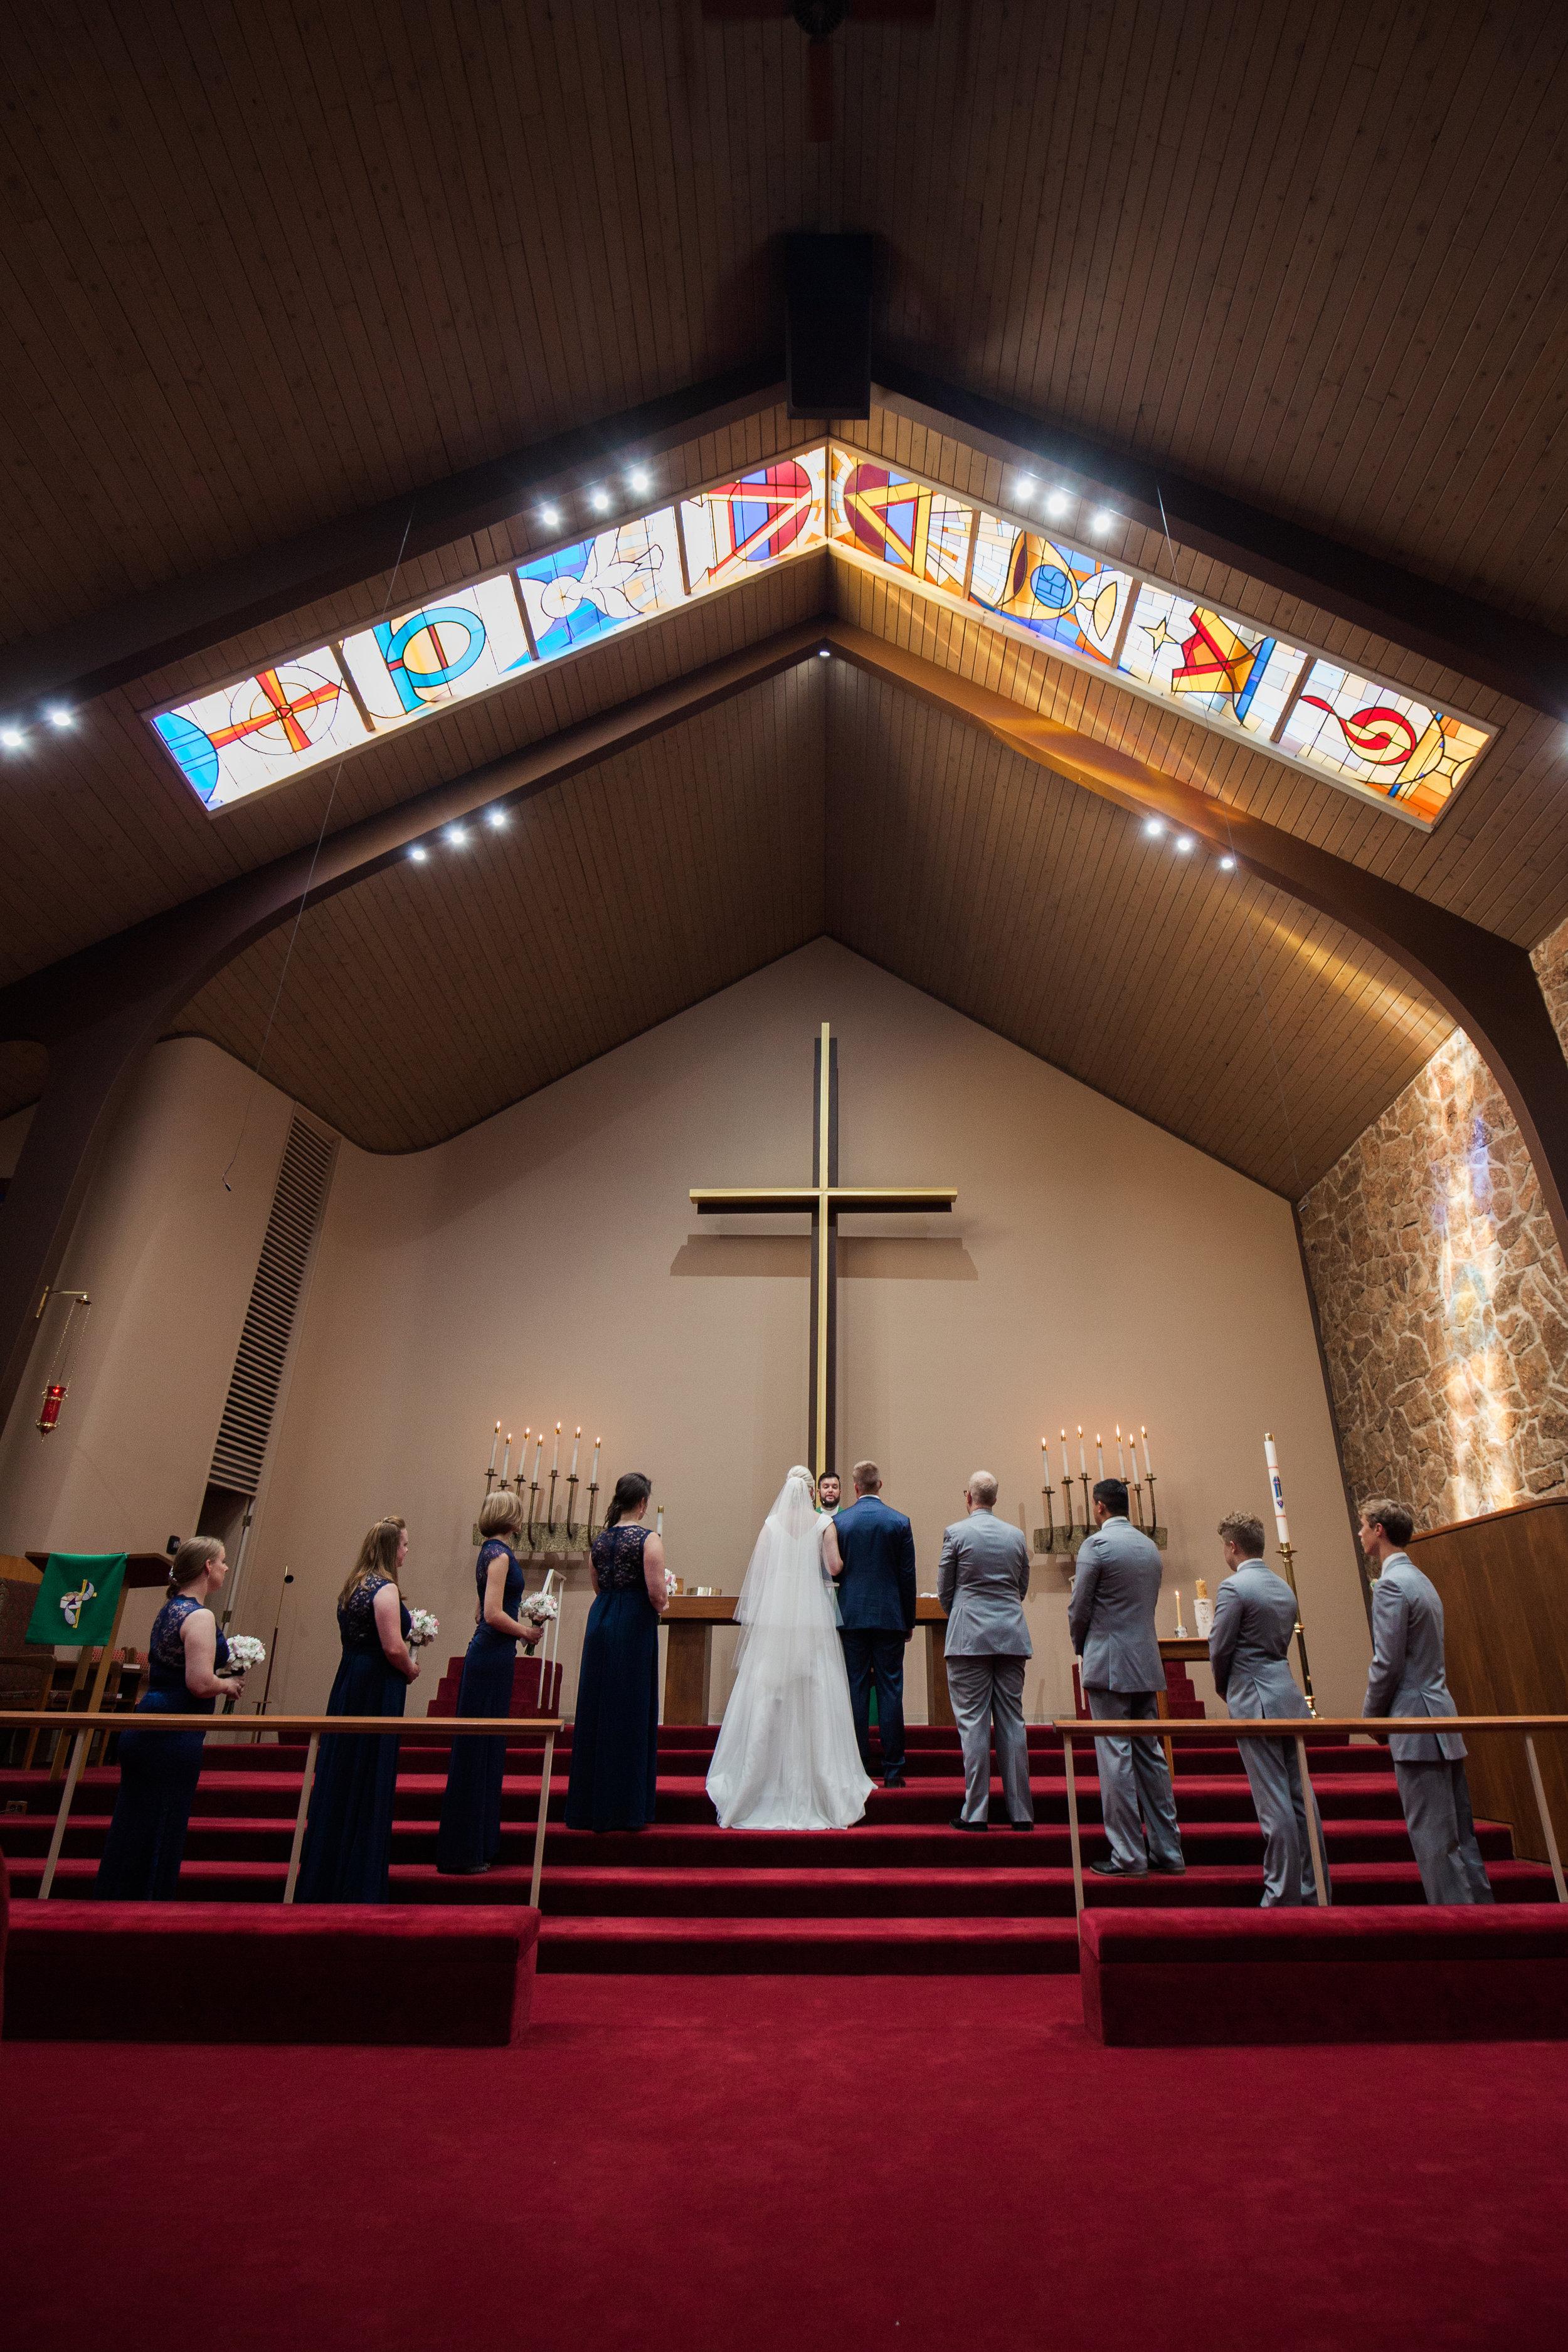 immanuel-lutheran-church.jpg